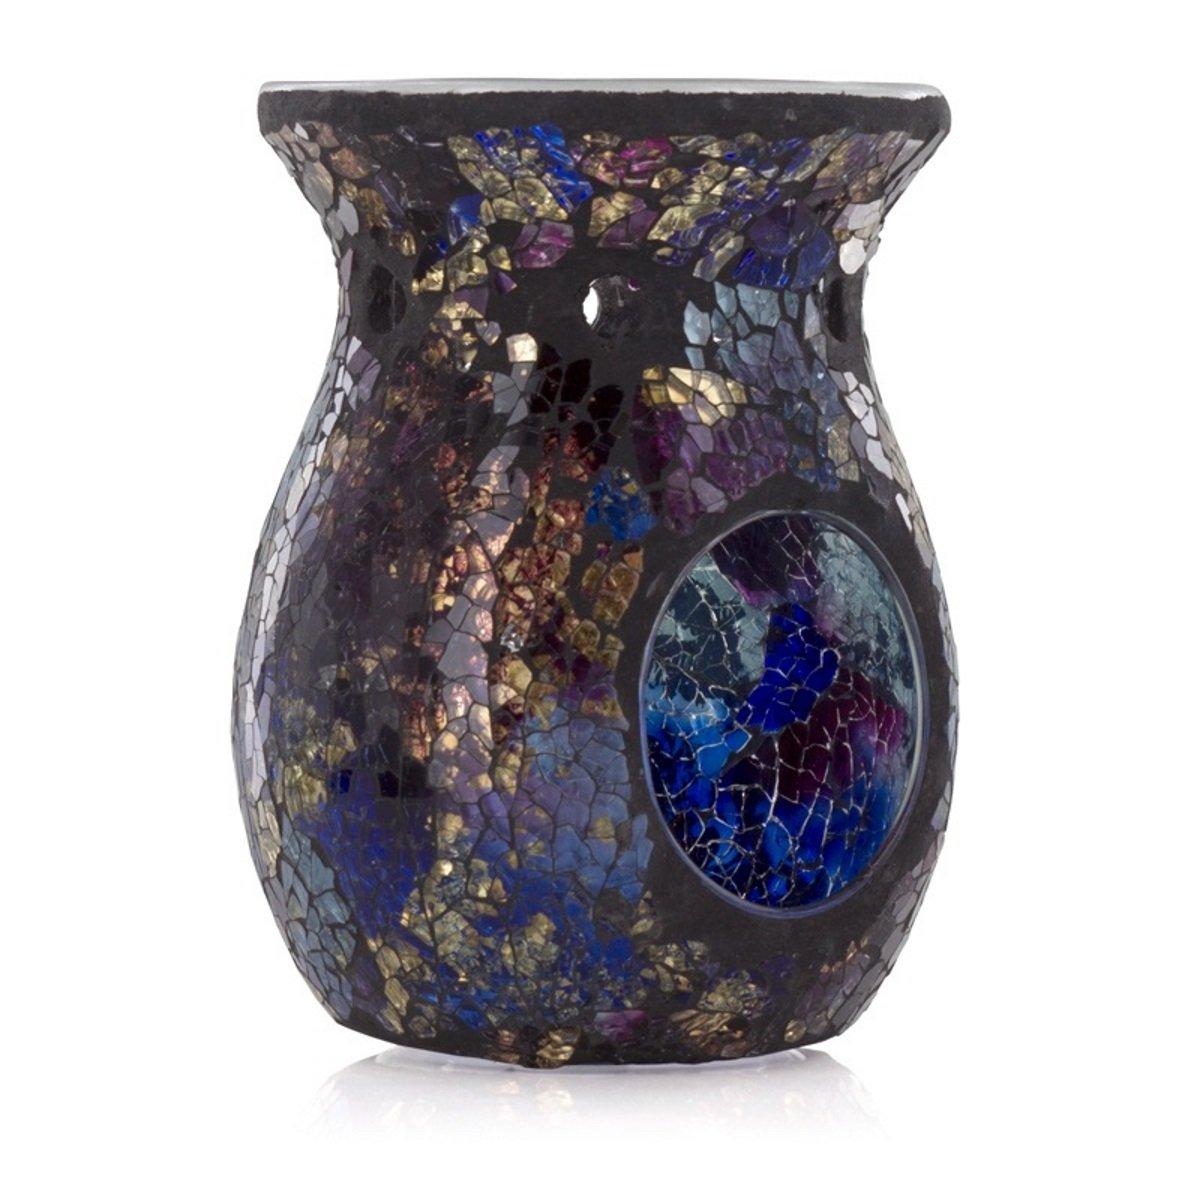 Classic Mosaic Oil Warmer Wax Warmer - Afterglow Ashleigh & Burwood MBCLA-694